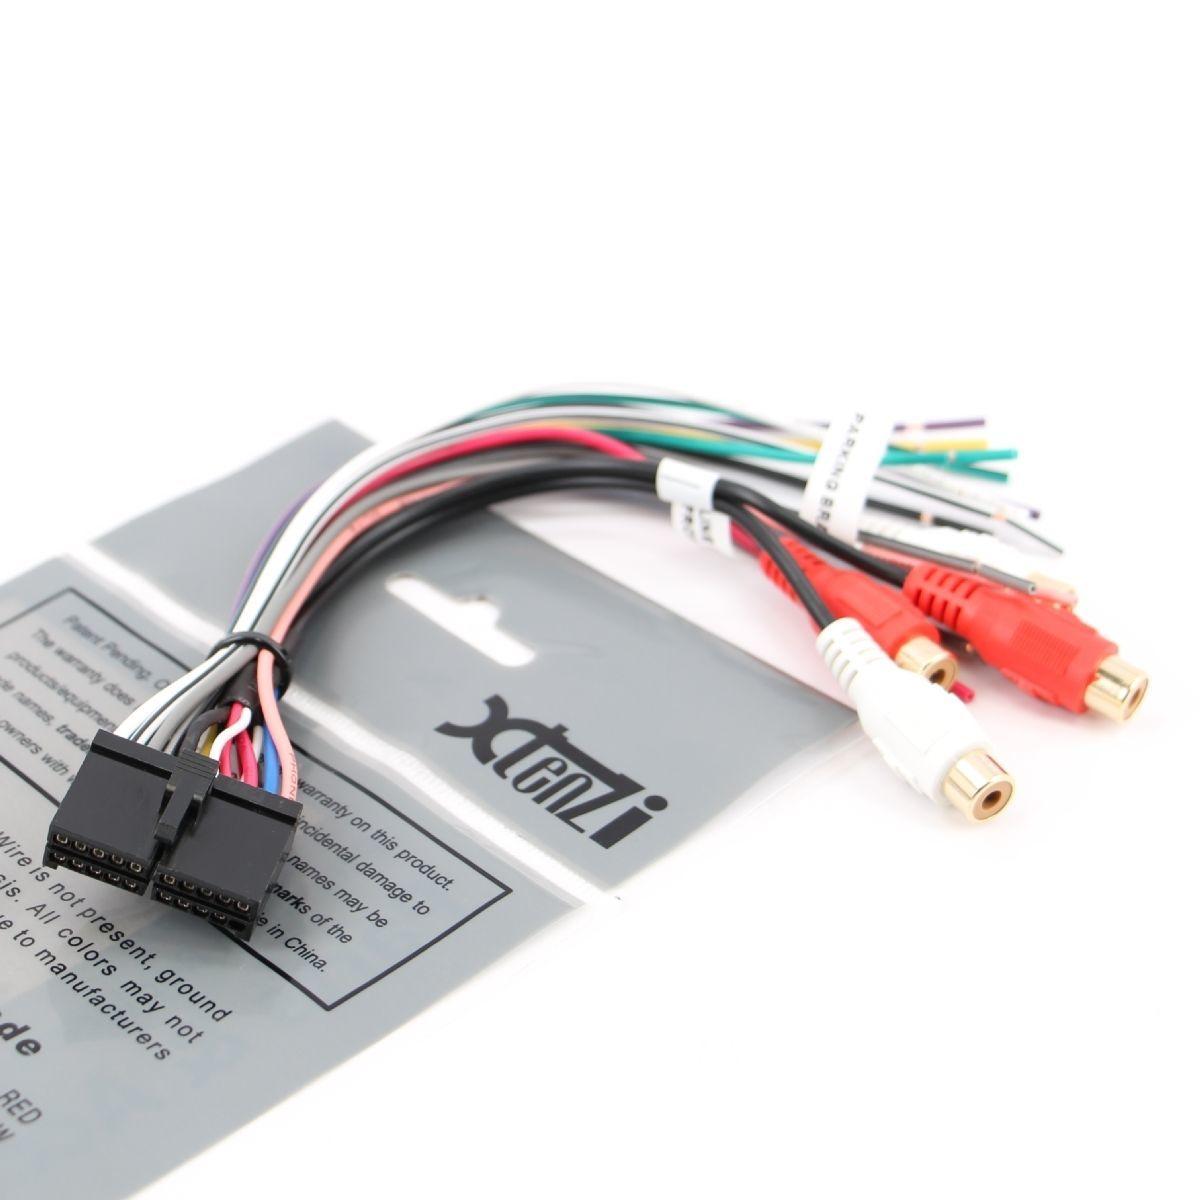 xtenzi 20 pin wire harness for jensen sd1513 vm9510 vm 9510 nontouch screen  new